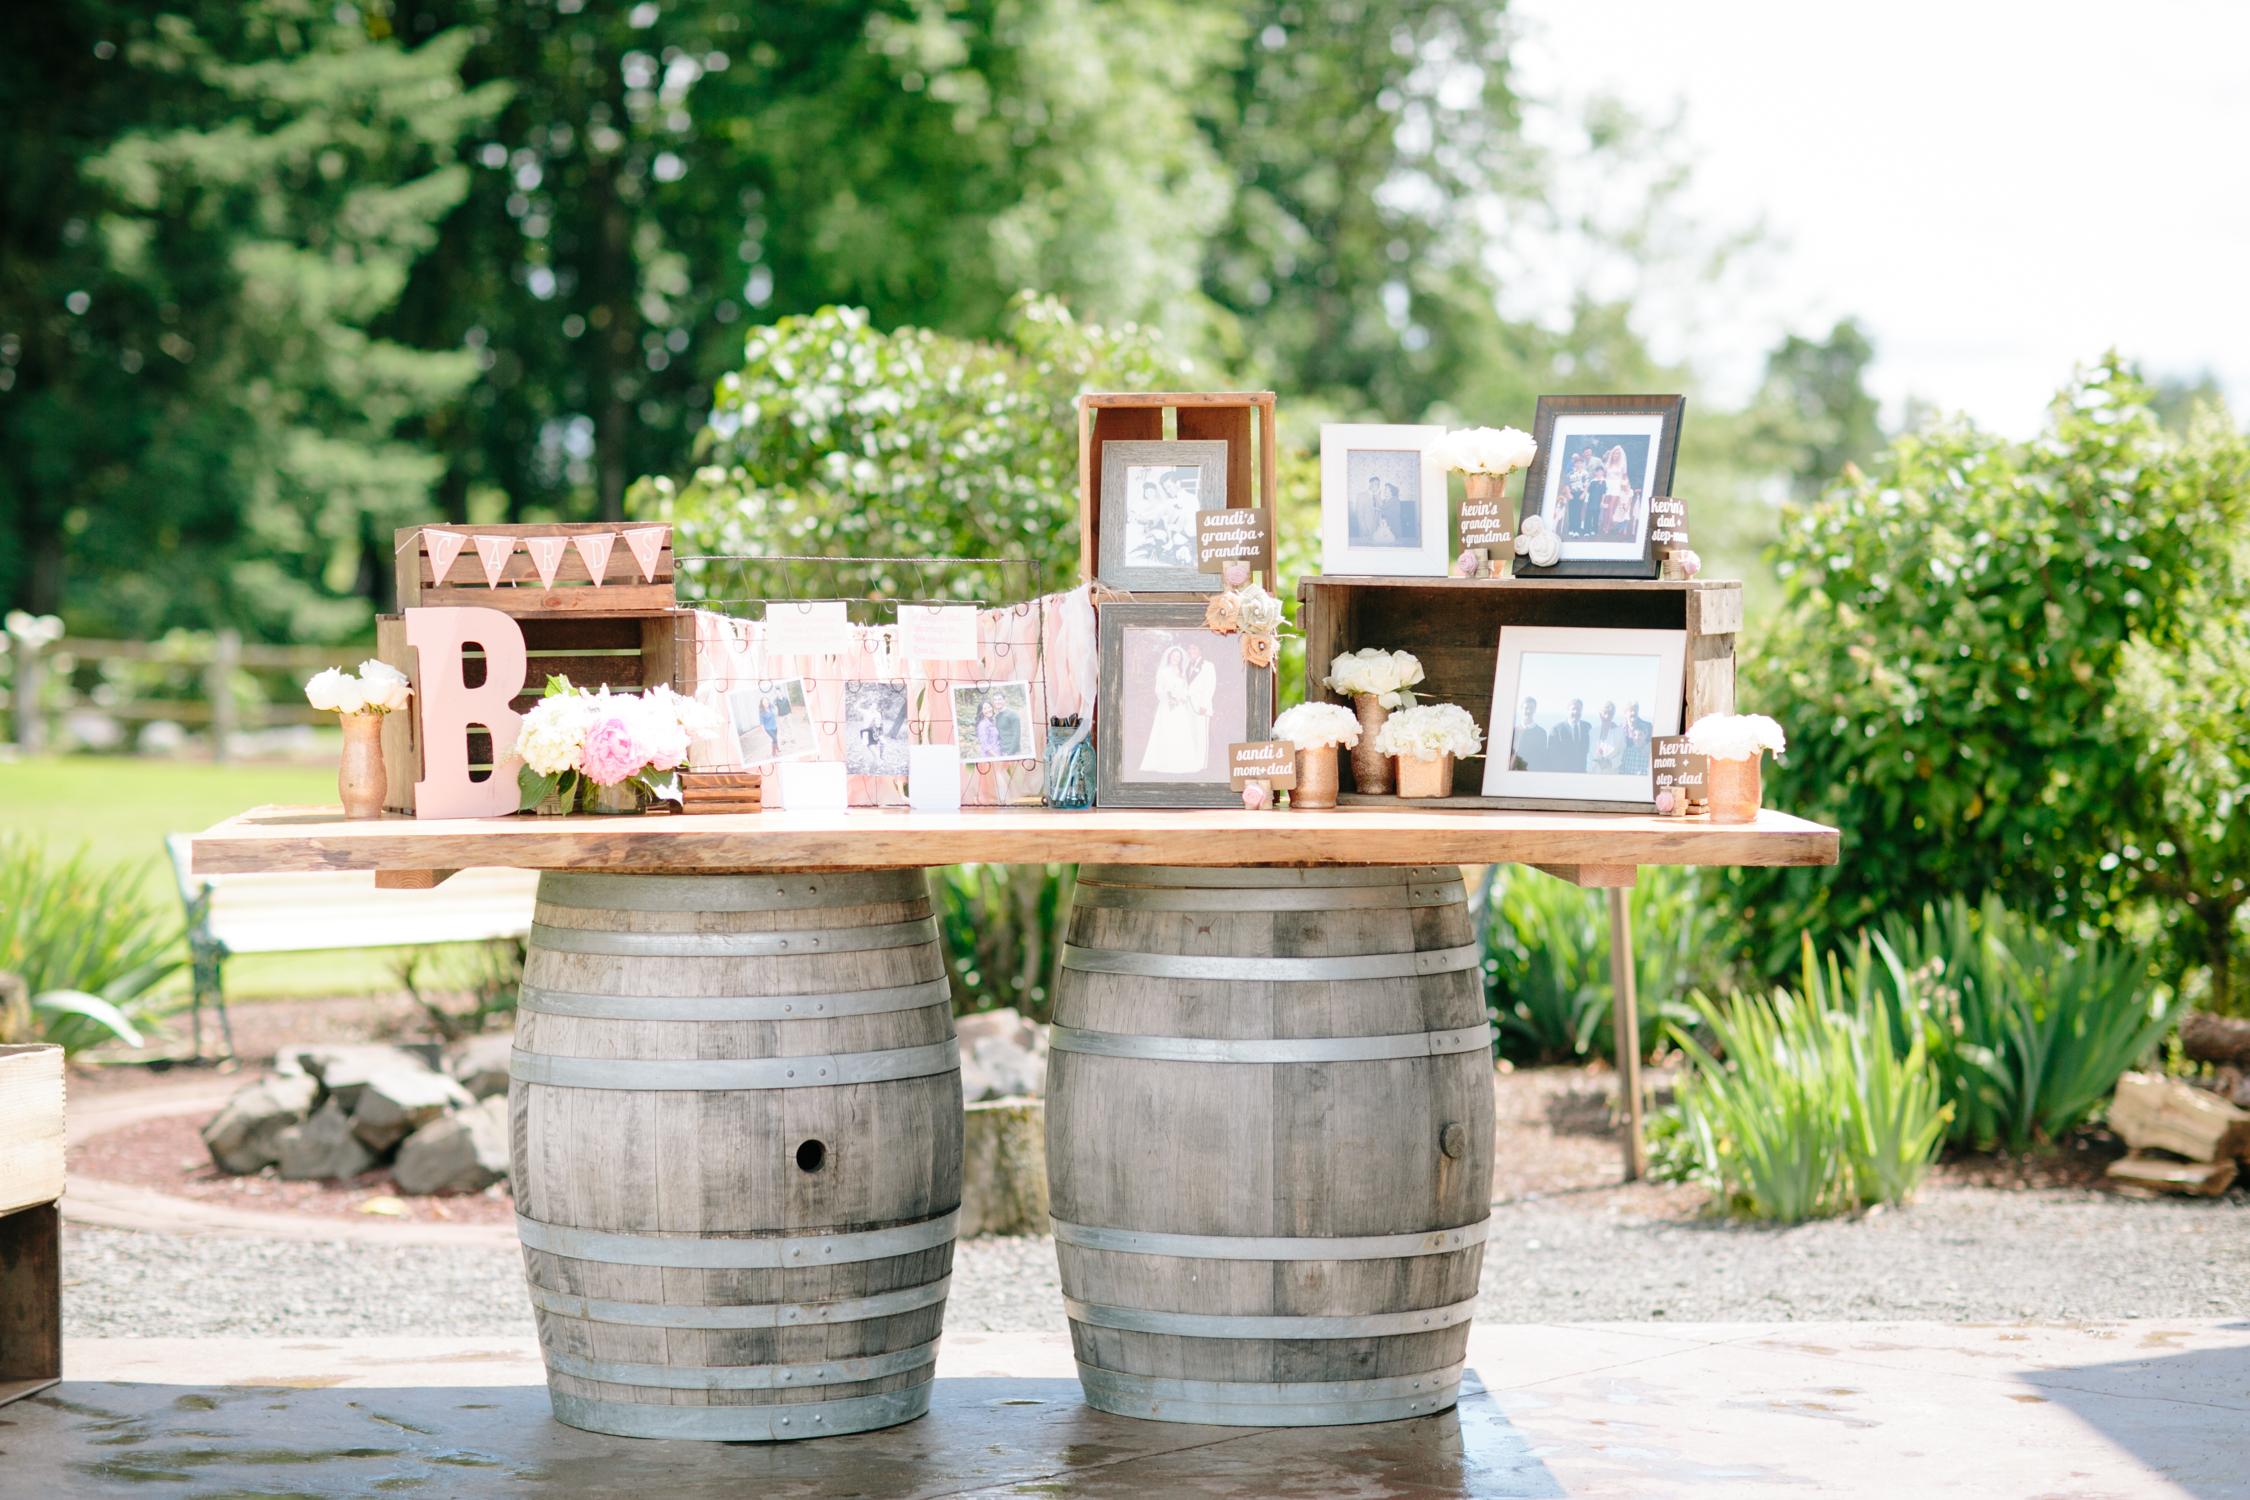 Postlewaits Oregon Wedding by Michelle Cross-15.jpg